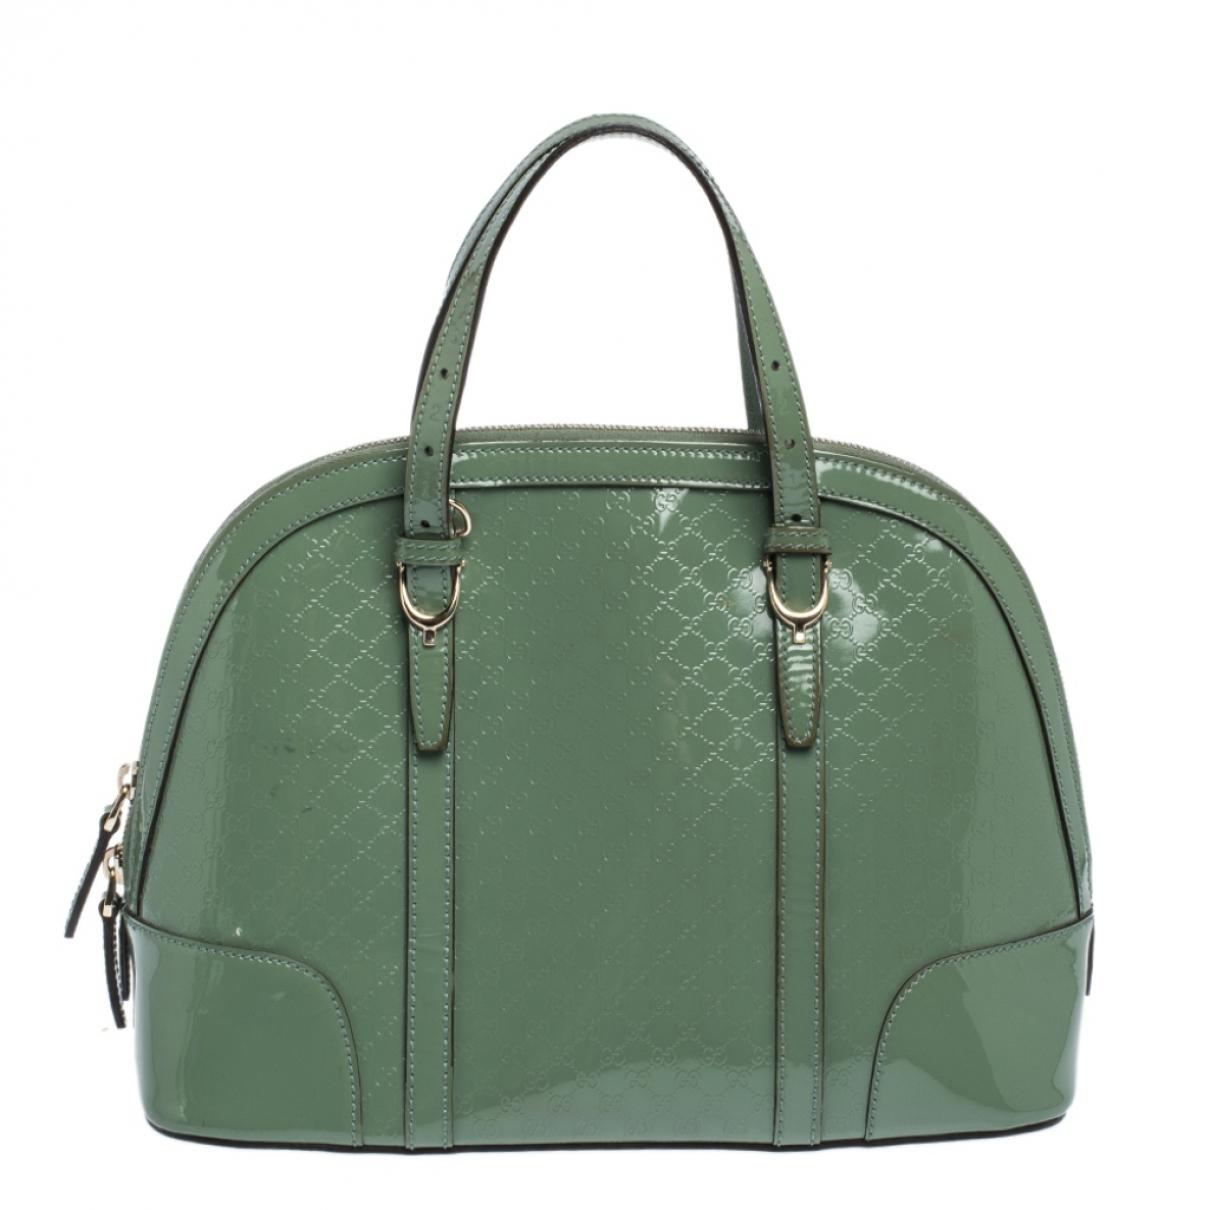 Gucci - Sac a main   pour femme en cuir verni - vert